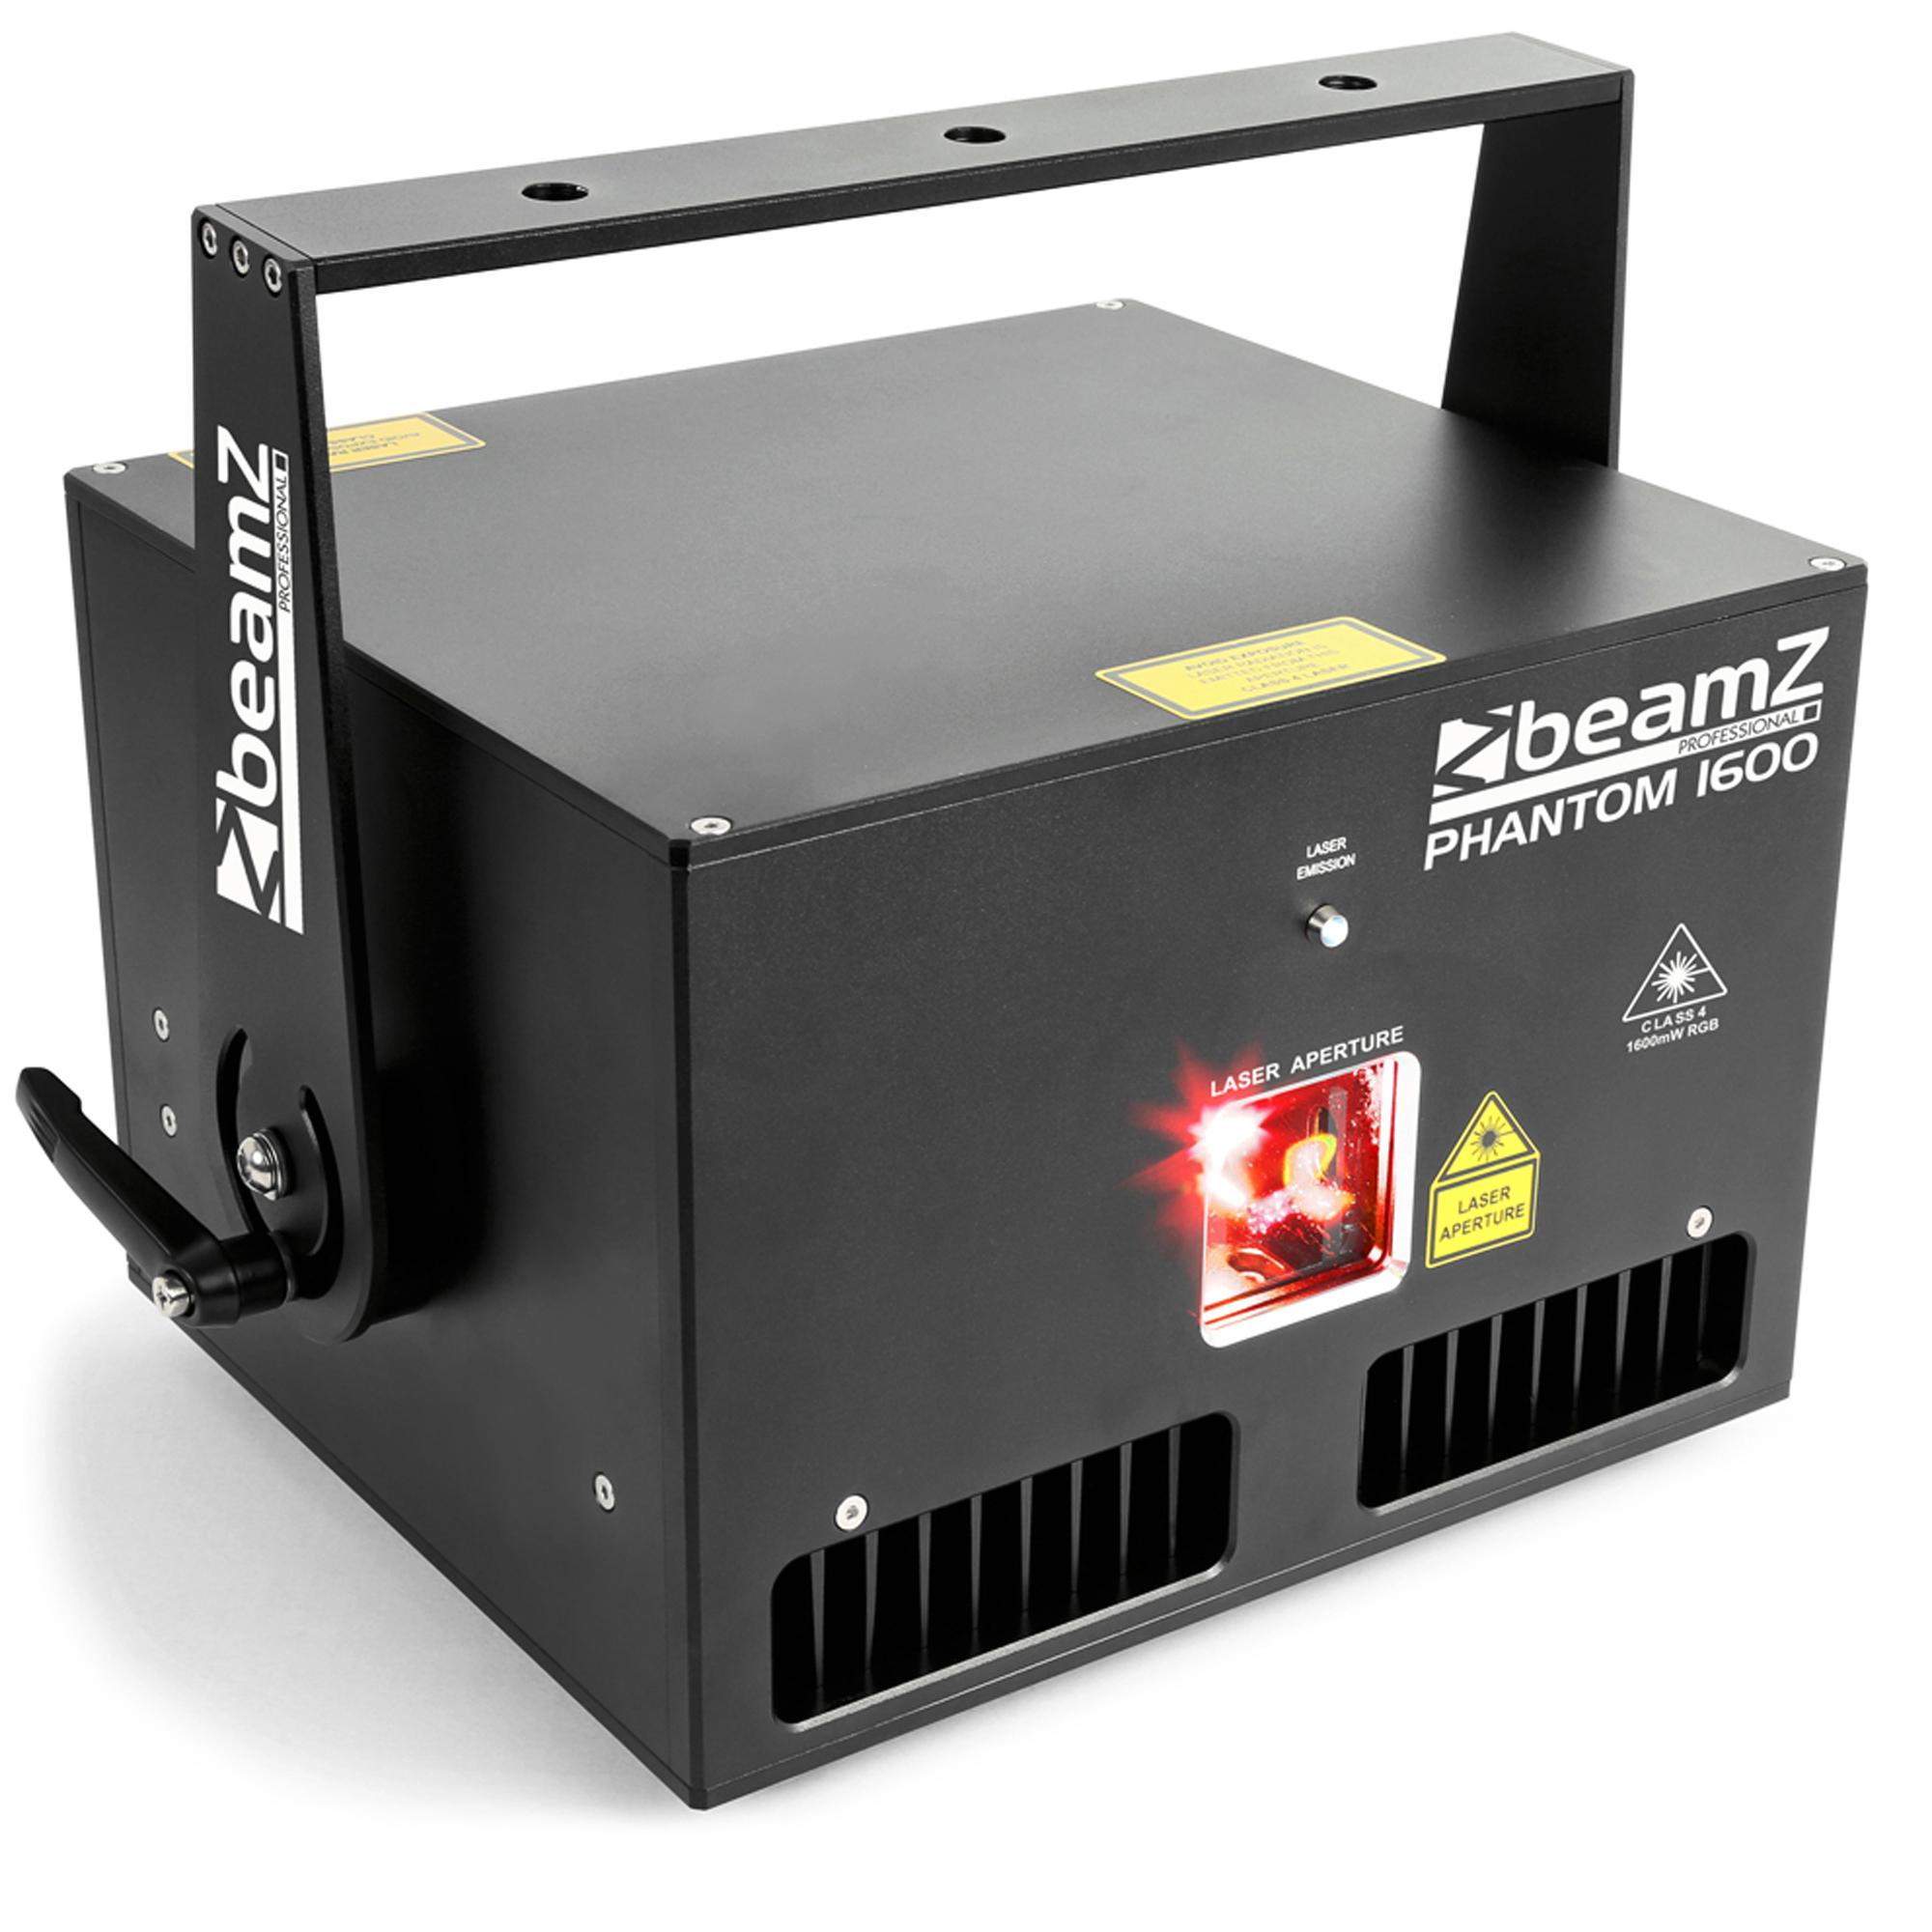 BeamZ Professional Phantom 1600 DJ Laser Light